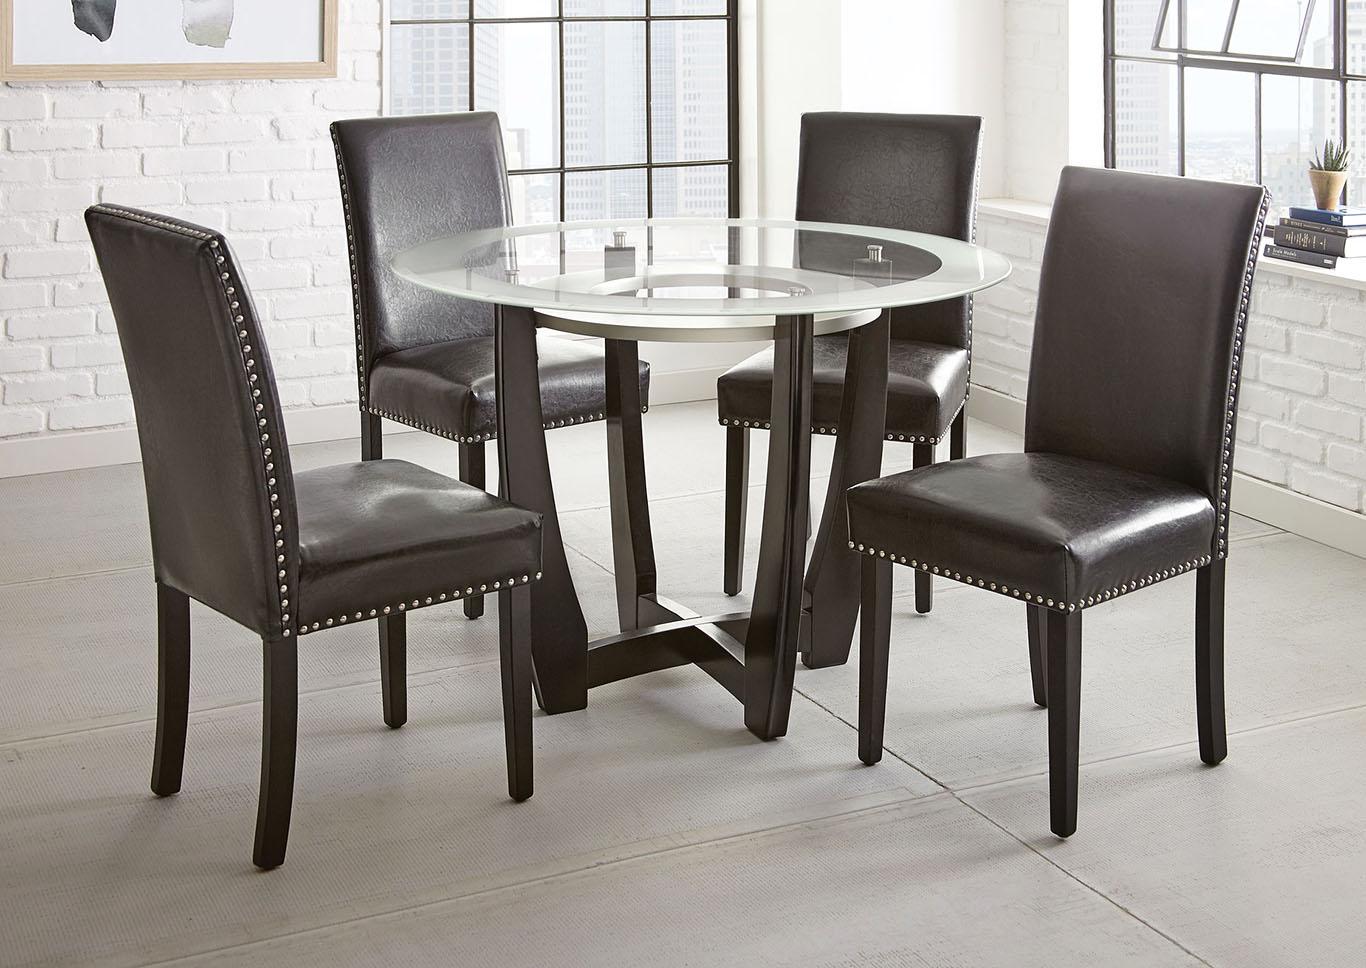 Verano Brown Round Glass Top Dining Set W/ 9 Chairs [Black] Ivan ...